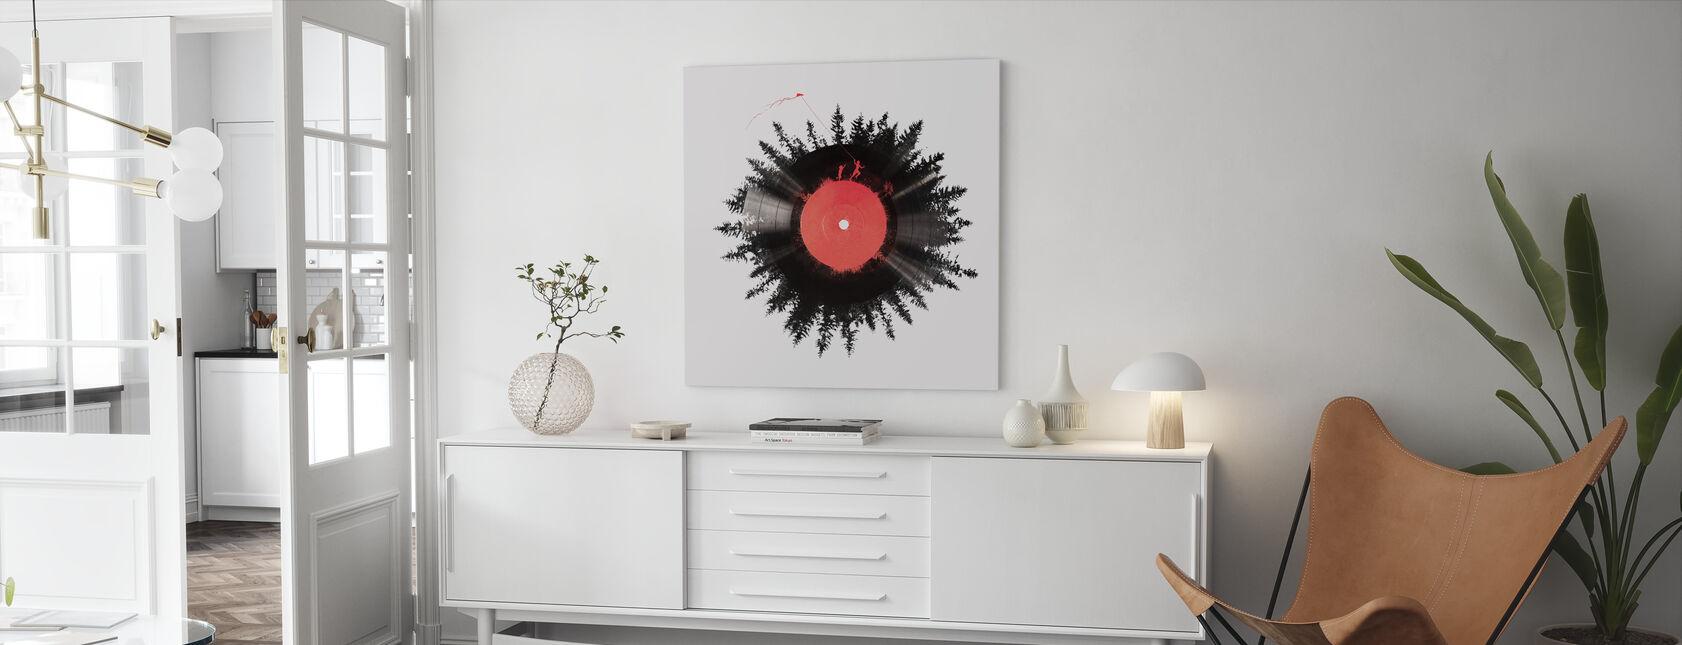 Vinyl av mitt liv - Lerretsbilde - Stue